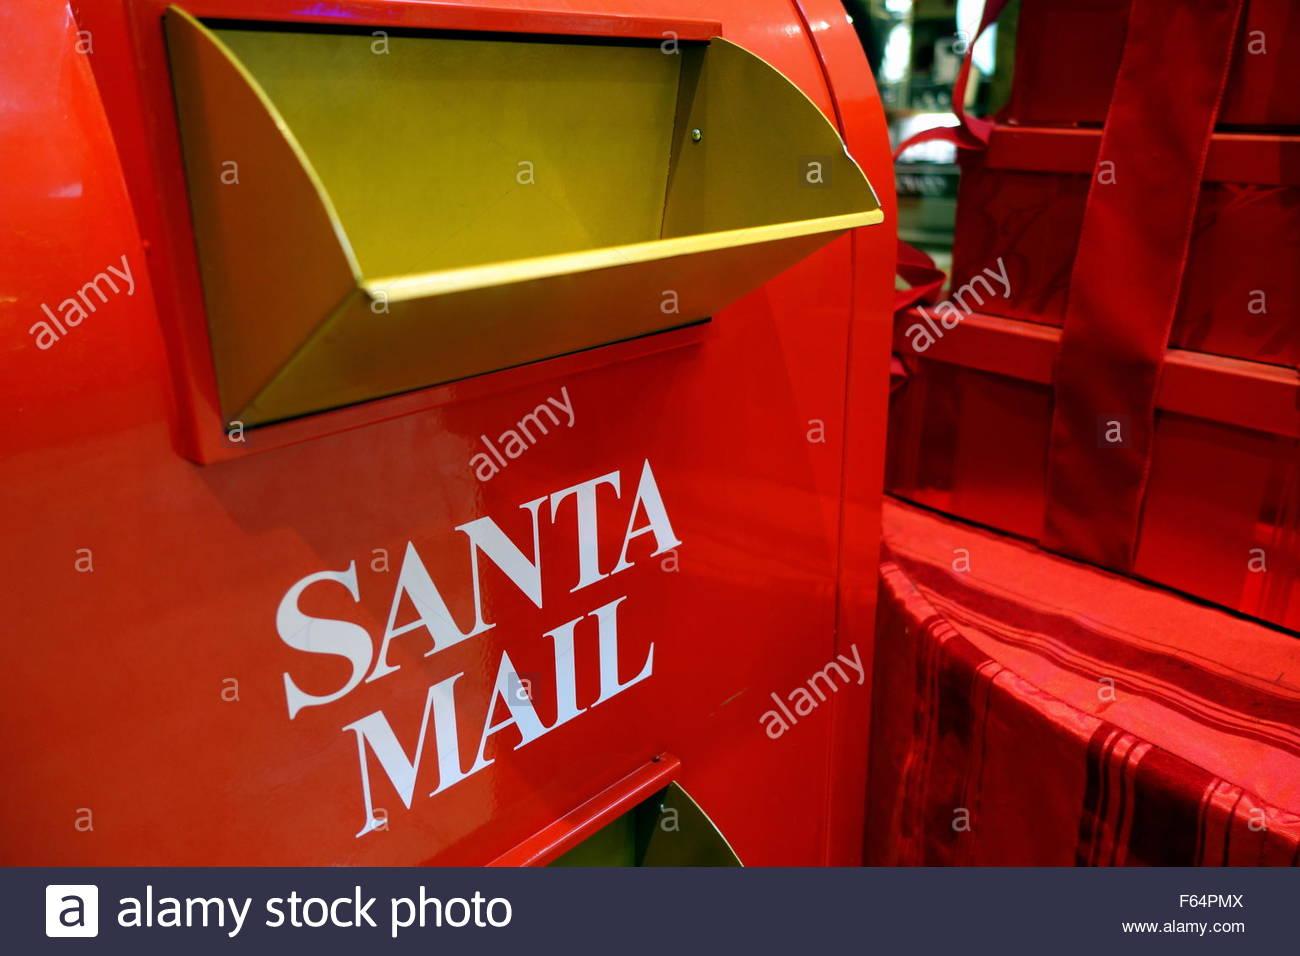 Santa mail - Stock Image